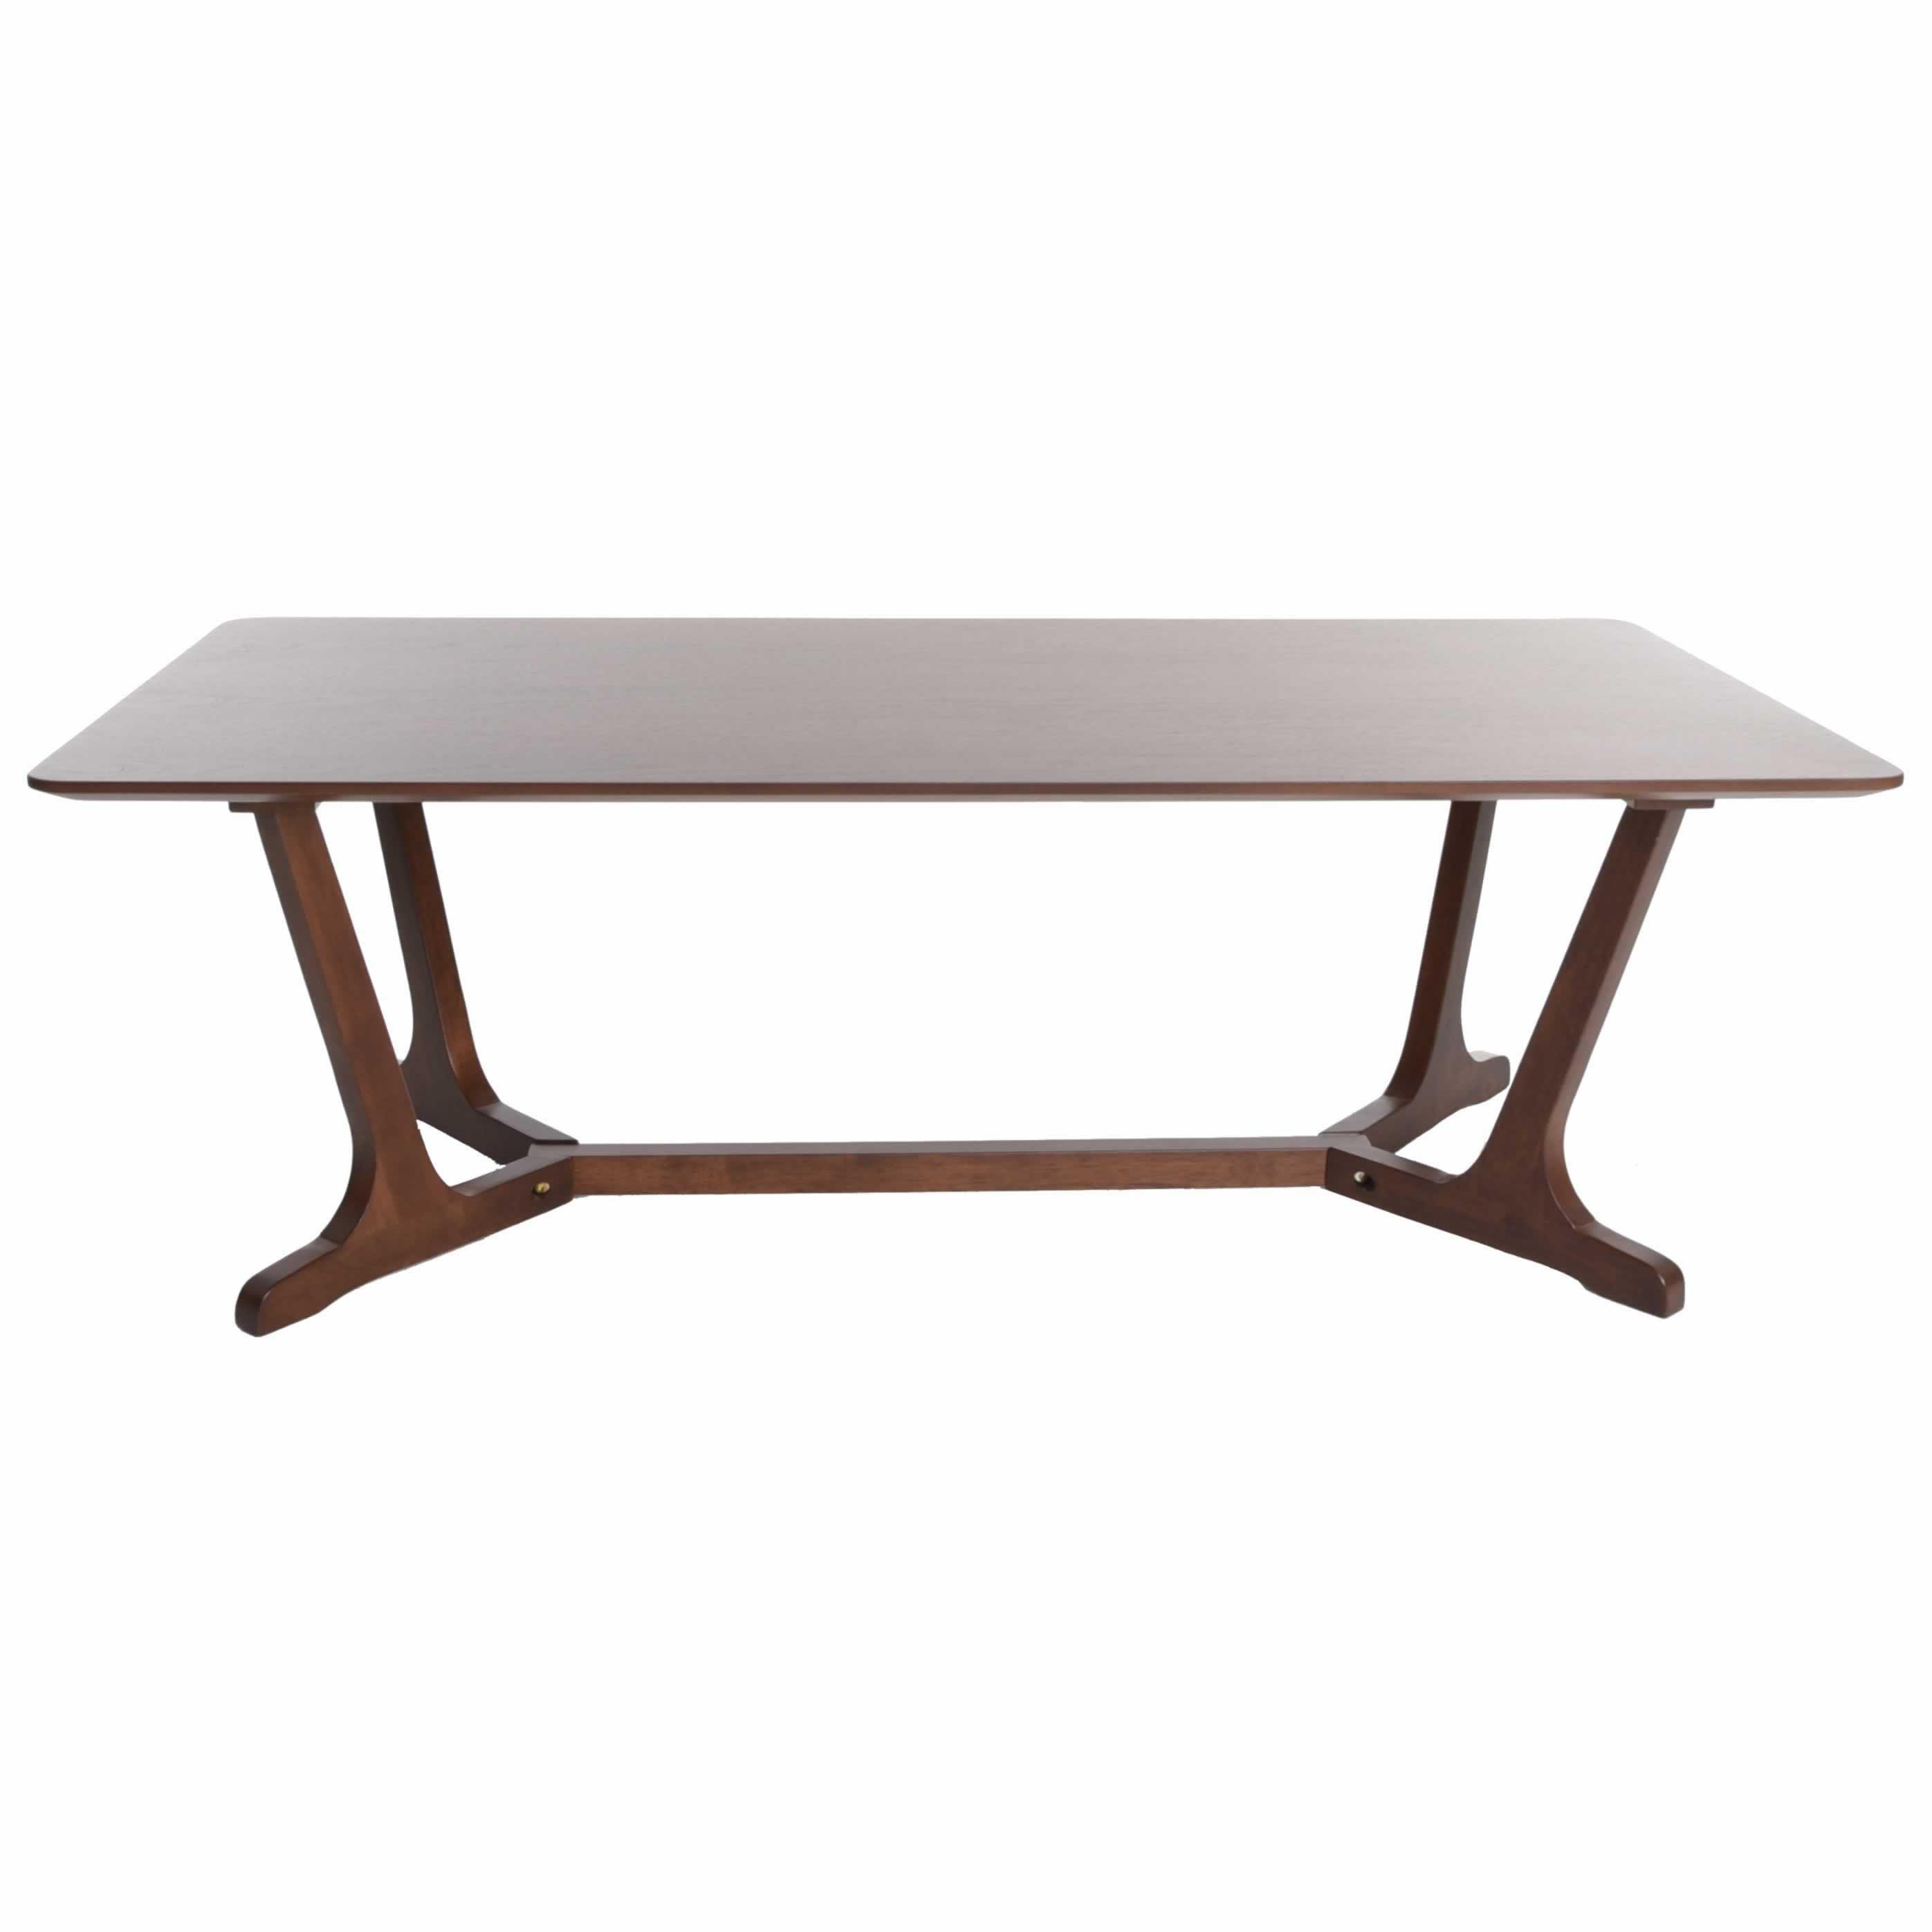 Zenvida Mid Century Modern Coffee Table For Living Room Rectangular Cocktail Table Wood Walmart Com Walmart Com